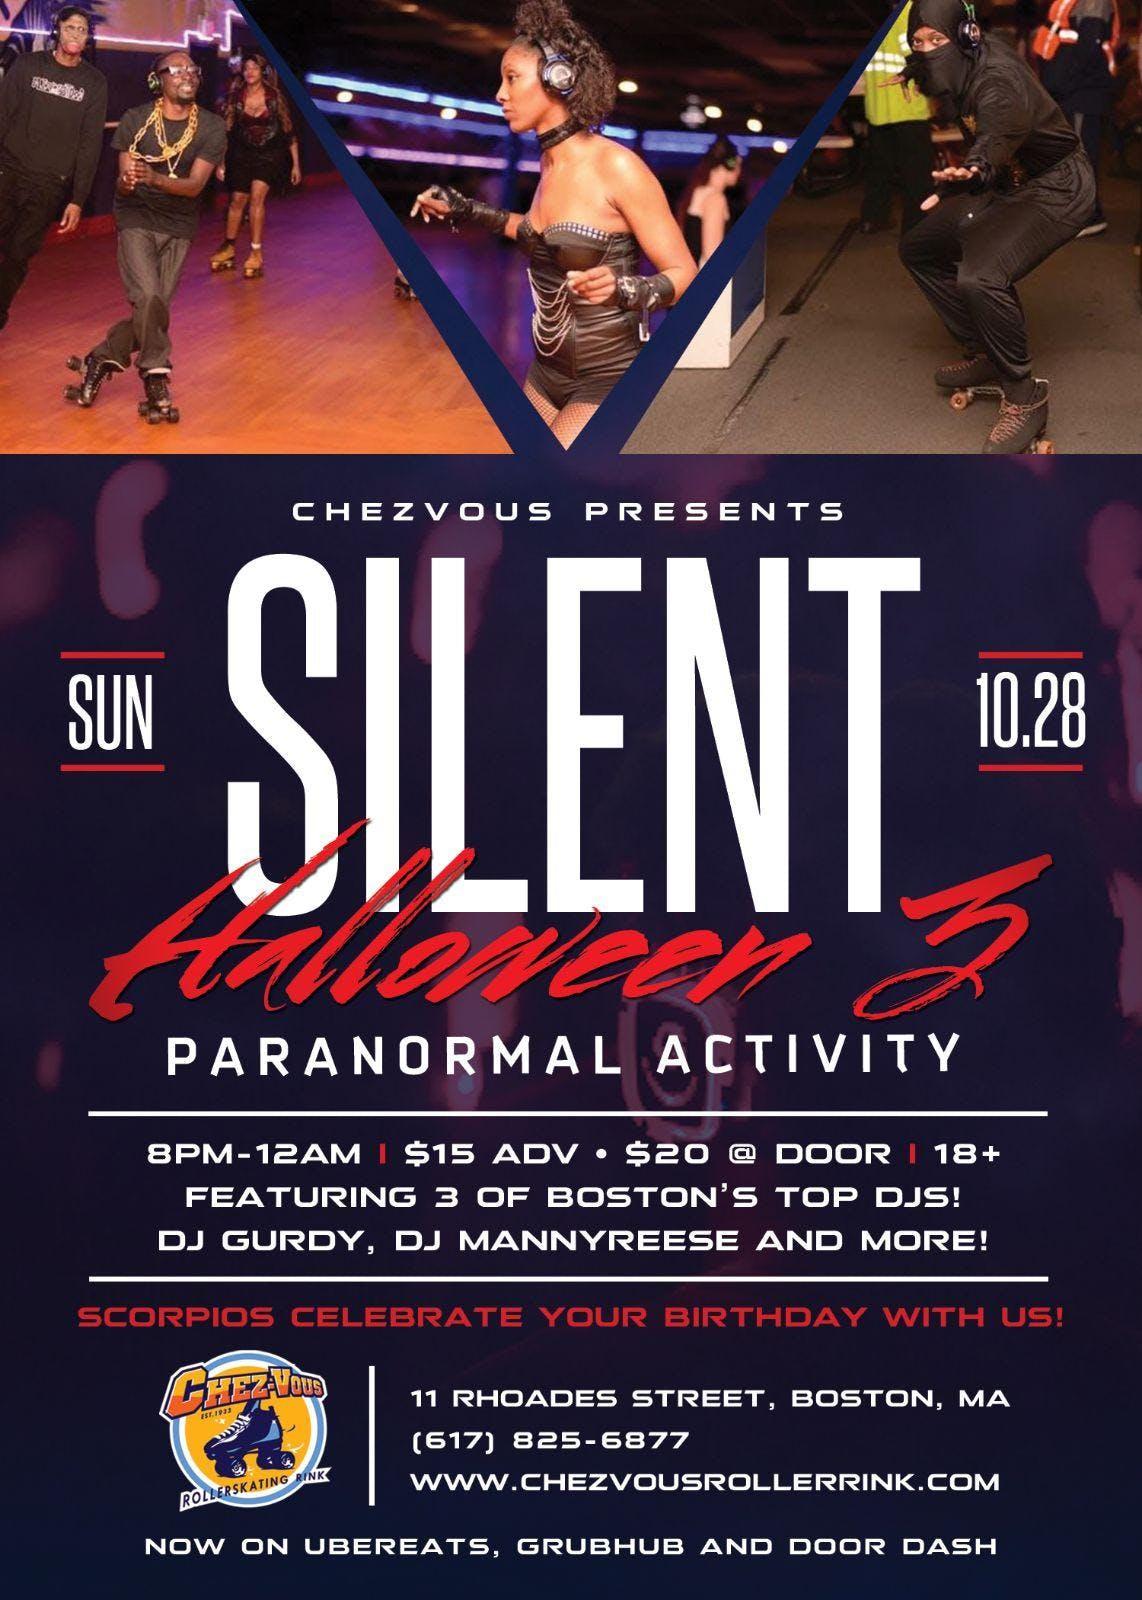 silent halloween 3 paranormal activity